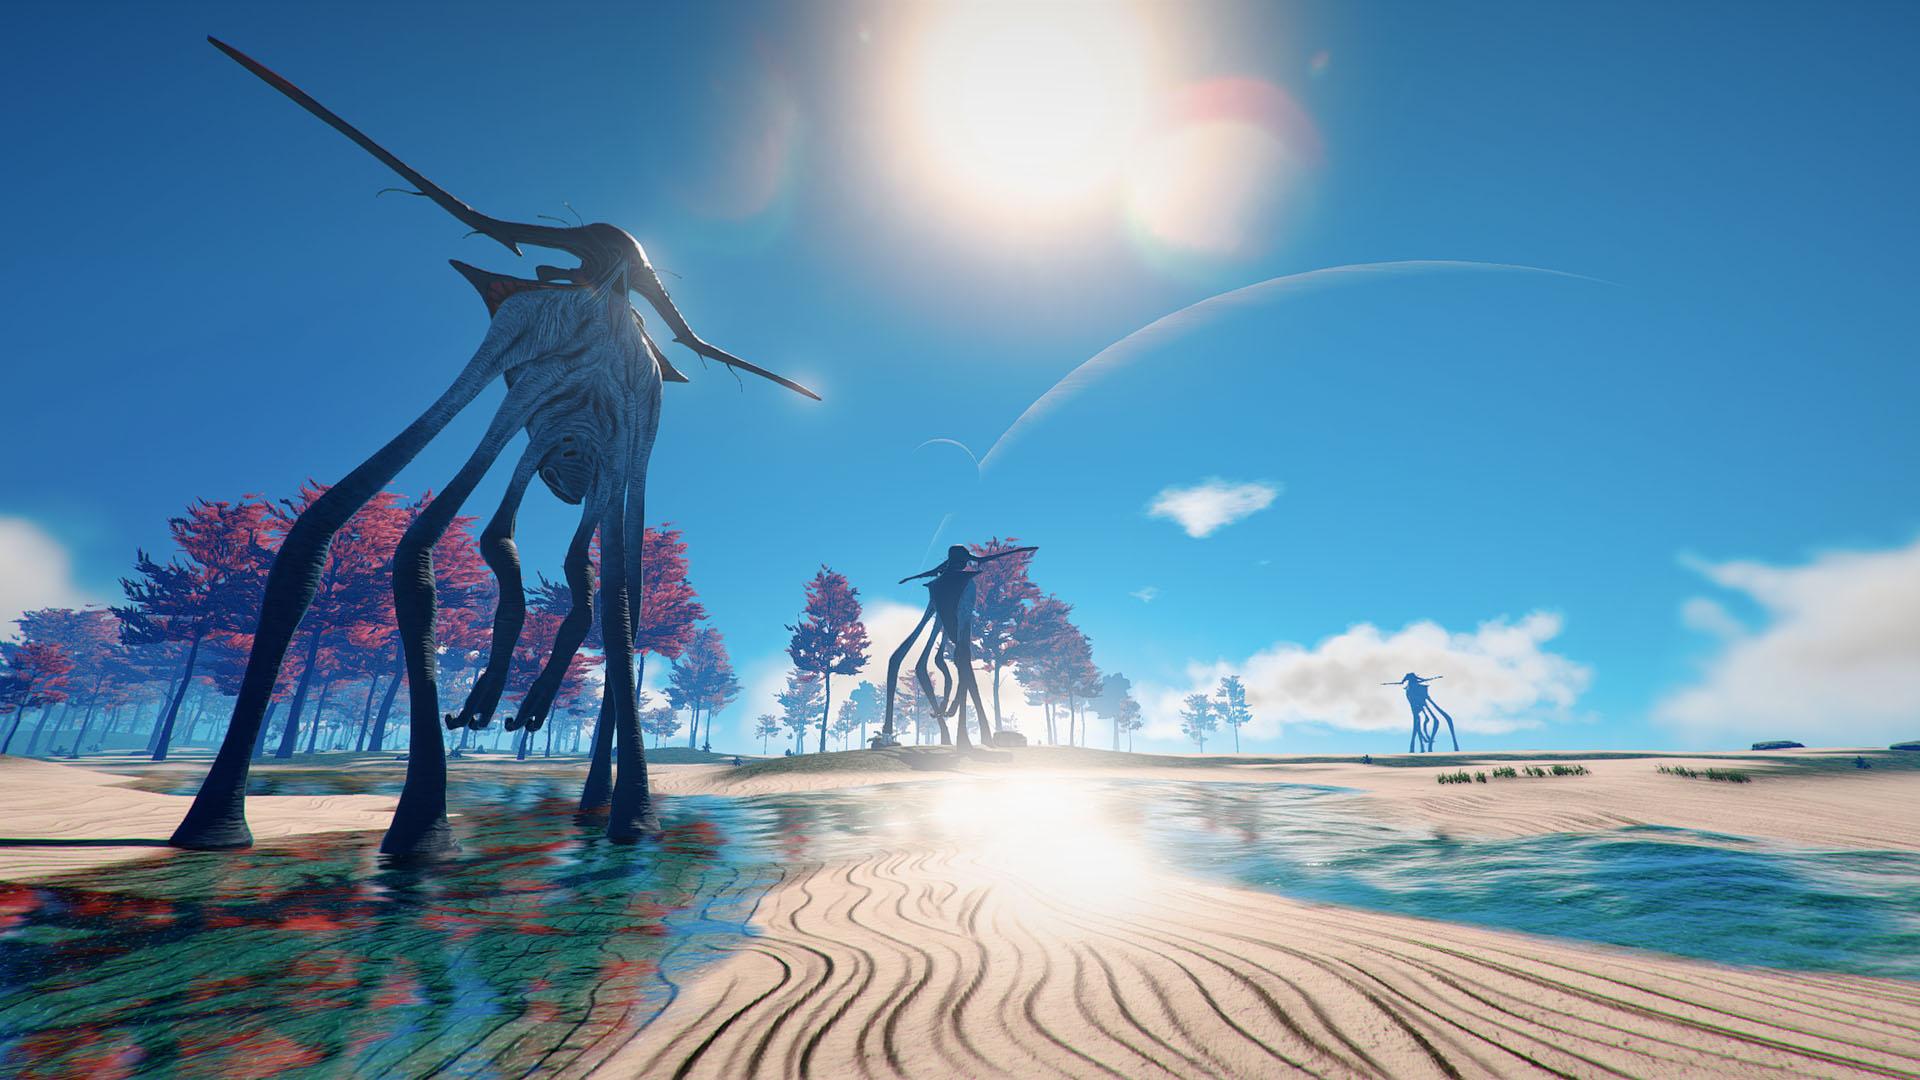 giant creature01